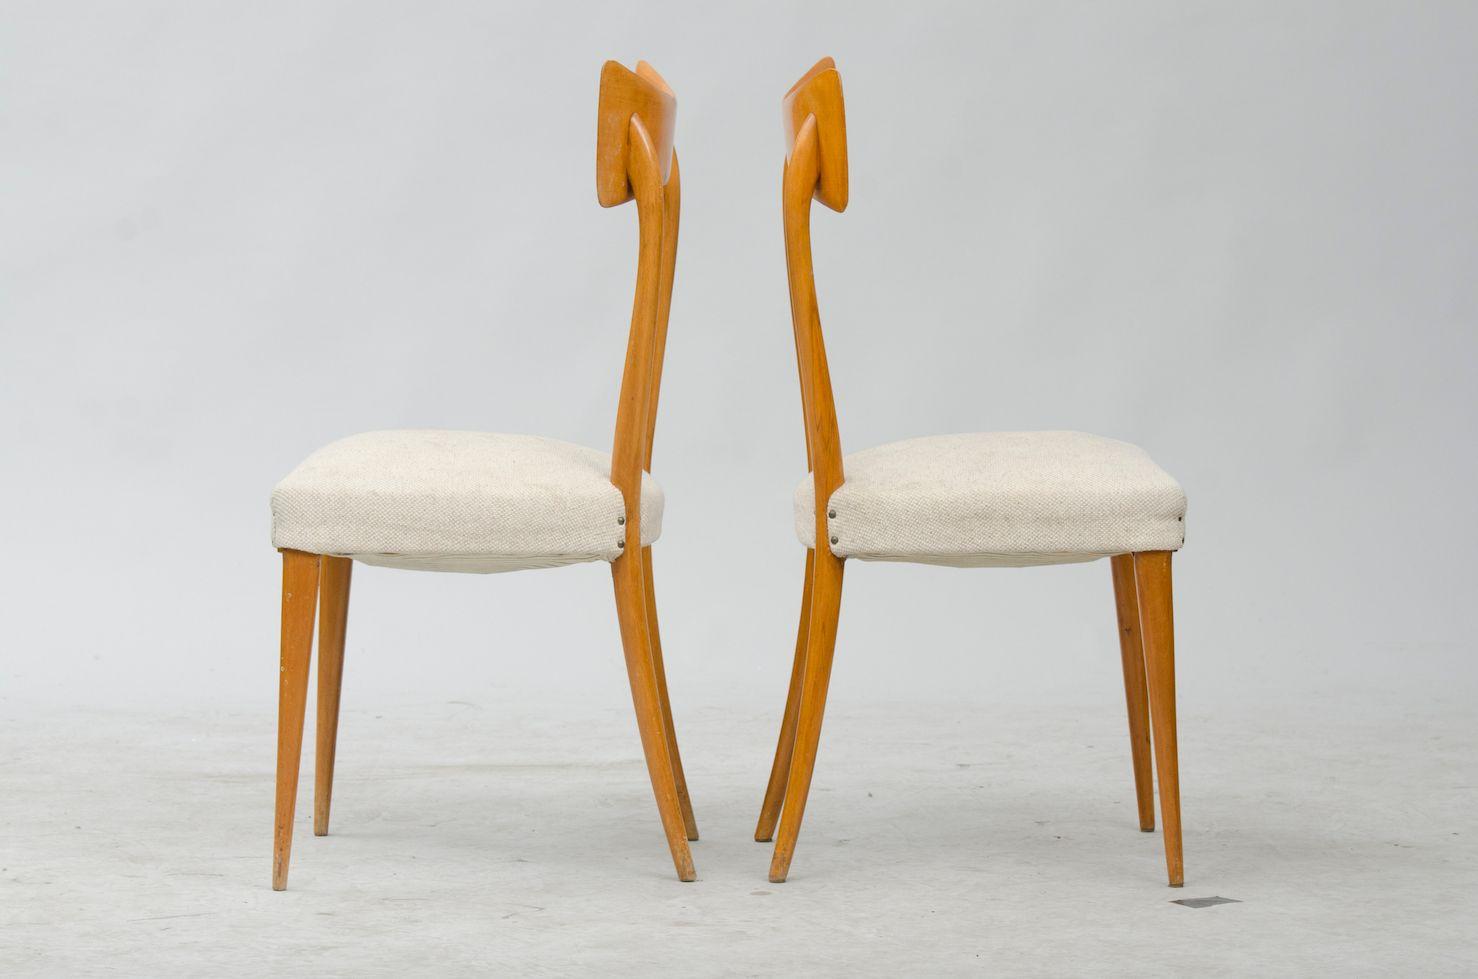 italienische vintage esszimmerst hle 6er set bei pamono. Black Bedroom Furniture Sets. Home Design Ideas